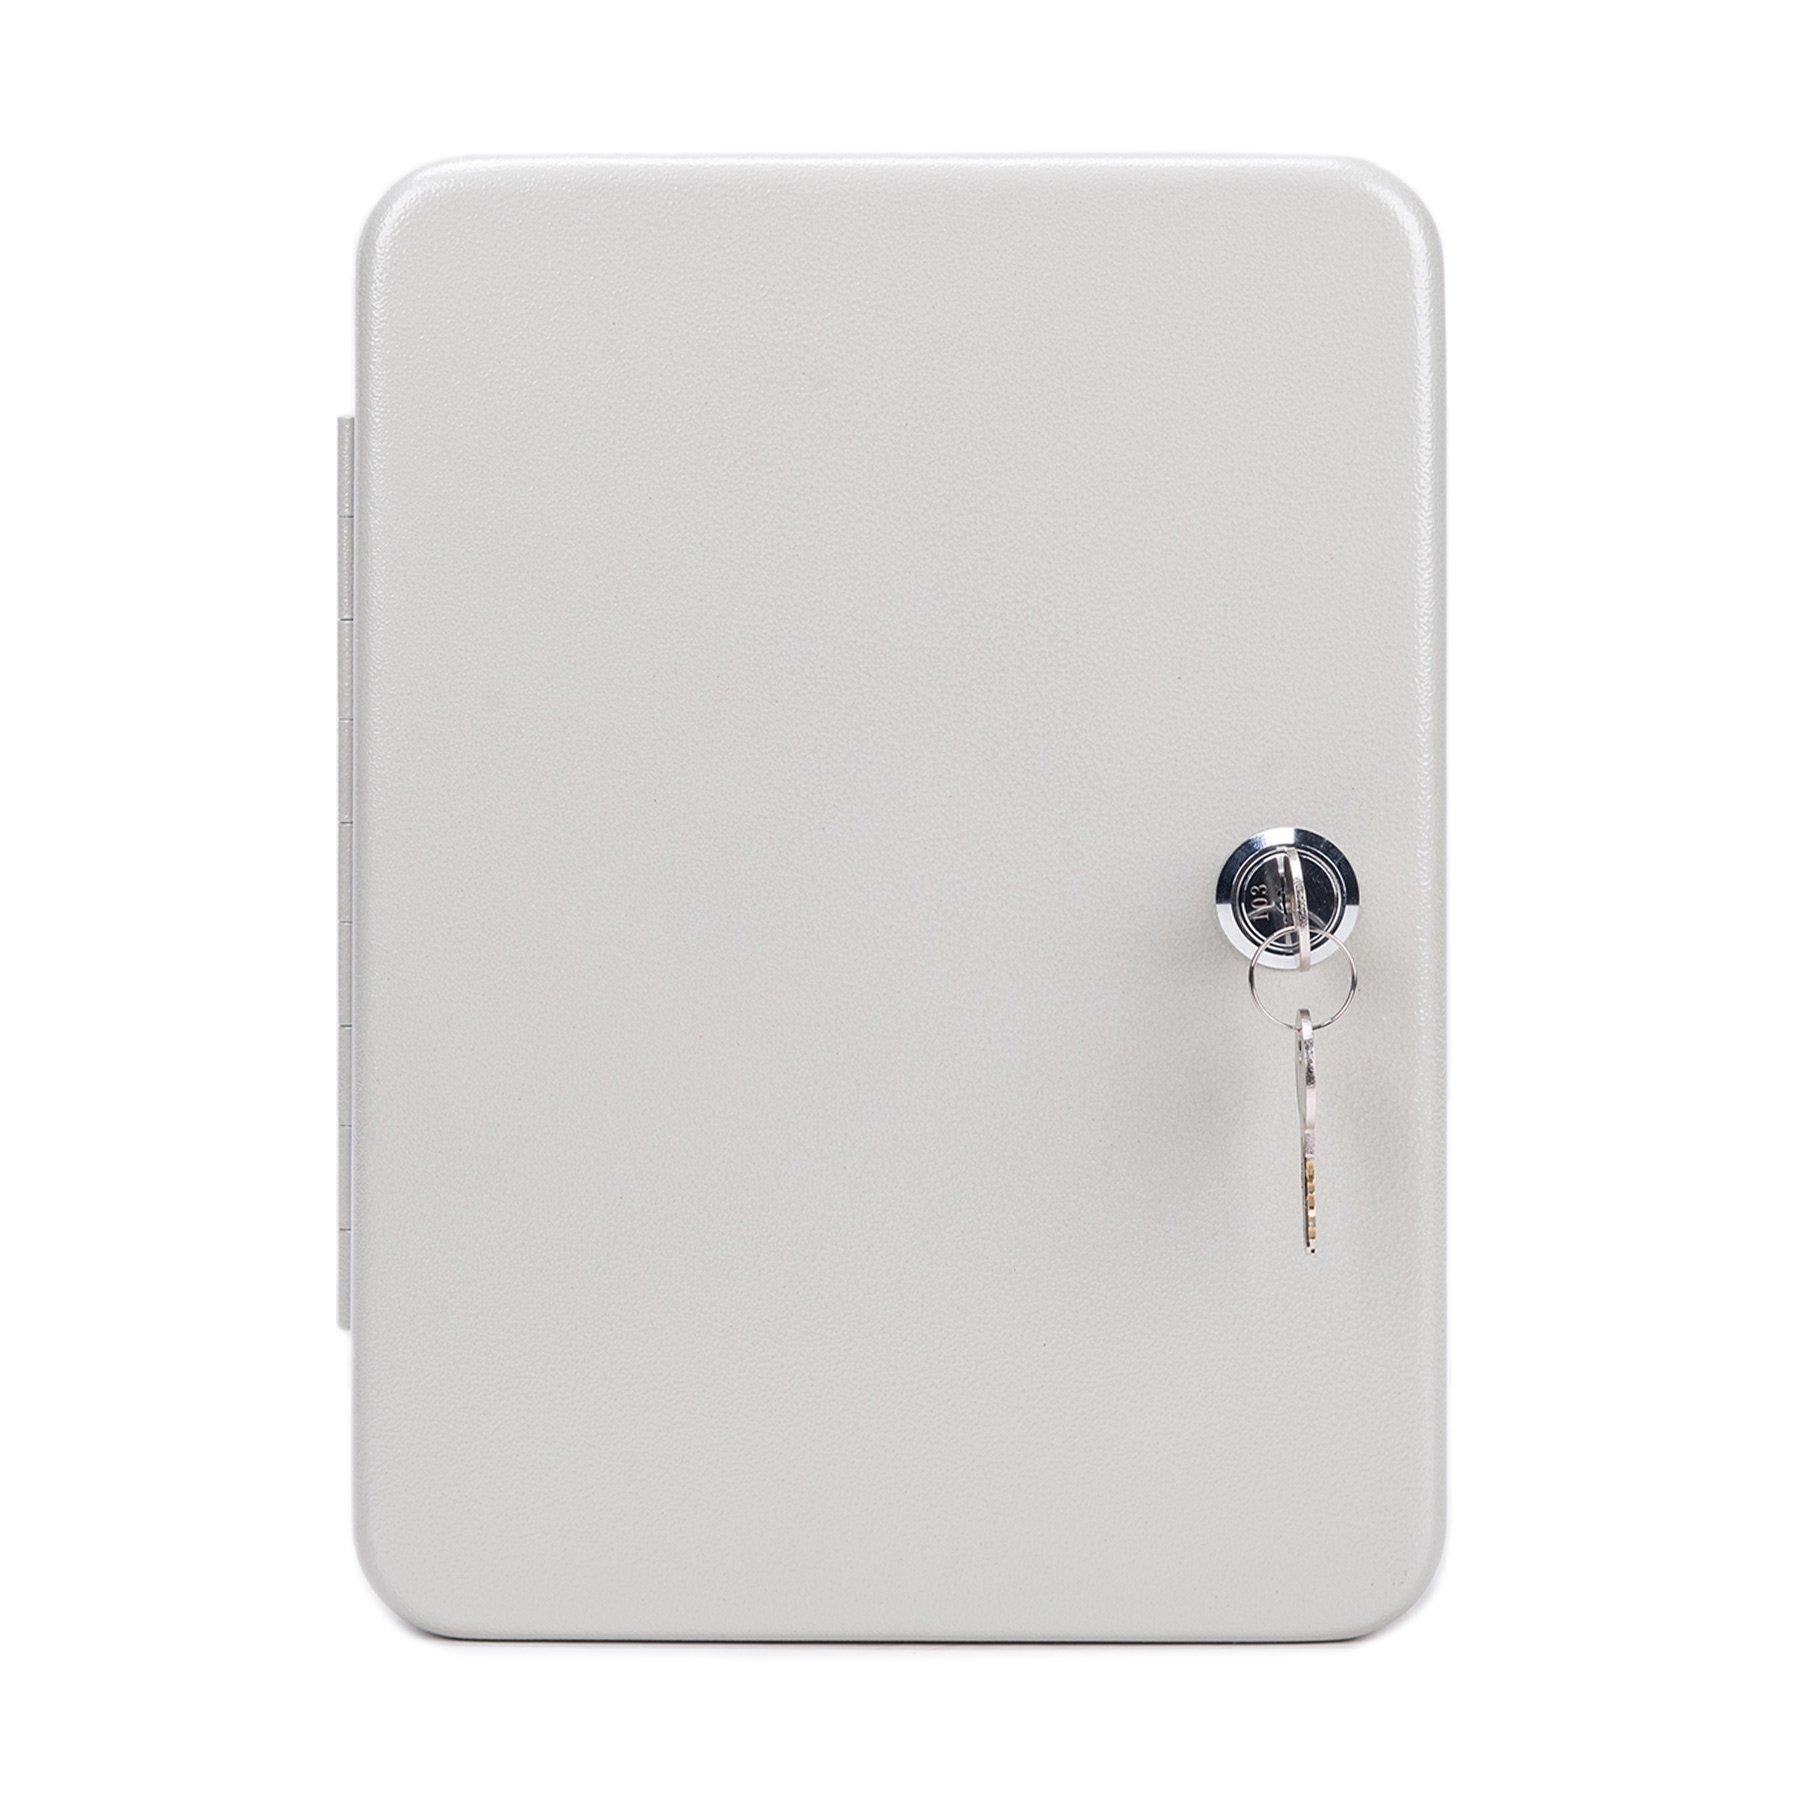 CO-Z Carbon Steel Key Cabinet Storage Box Organizer for Keys with Mechanical Lock 2 keys (white for 48 keys)